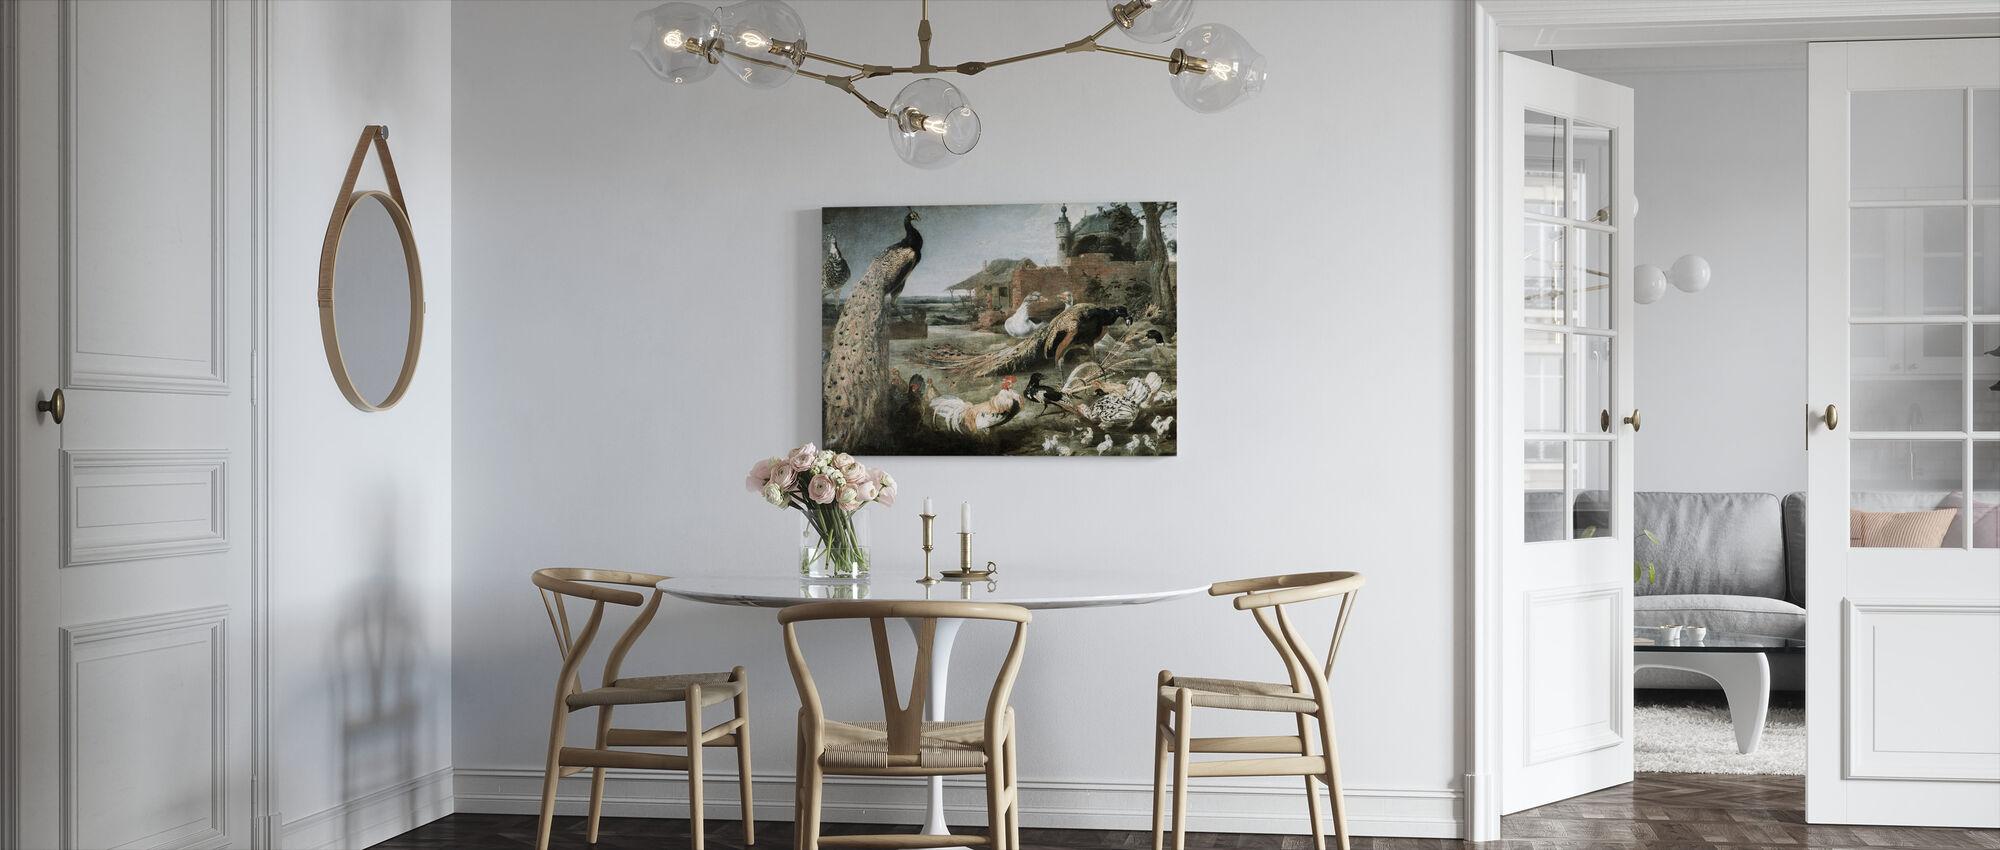 Varis riikinkukon höyhenet - Frans Snyders - Canvastaulu - Keittiö